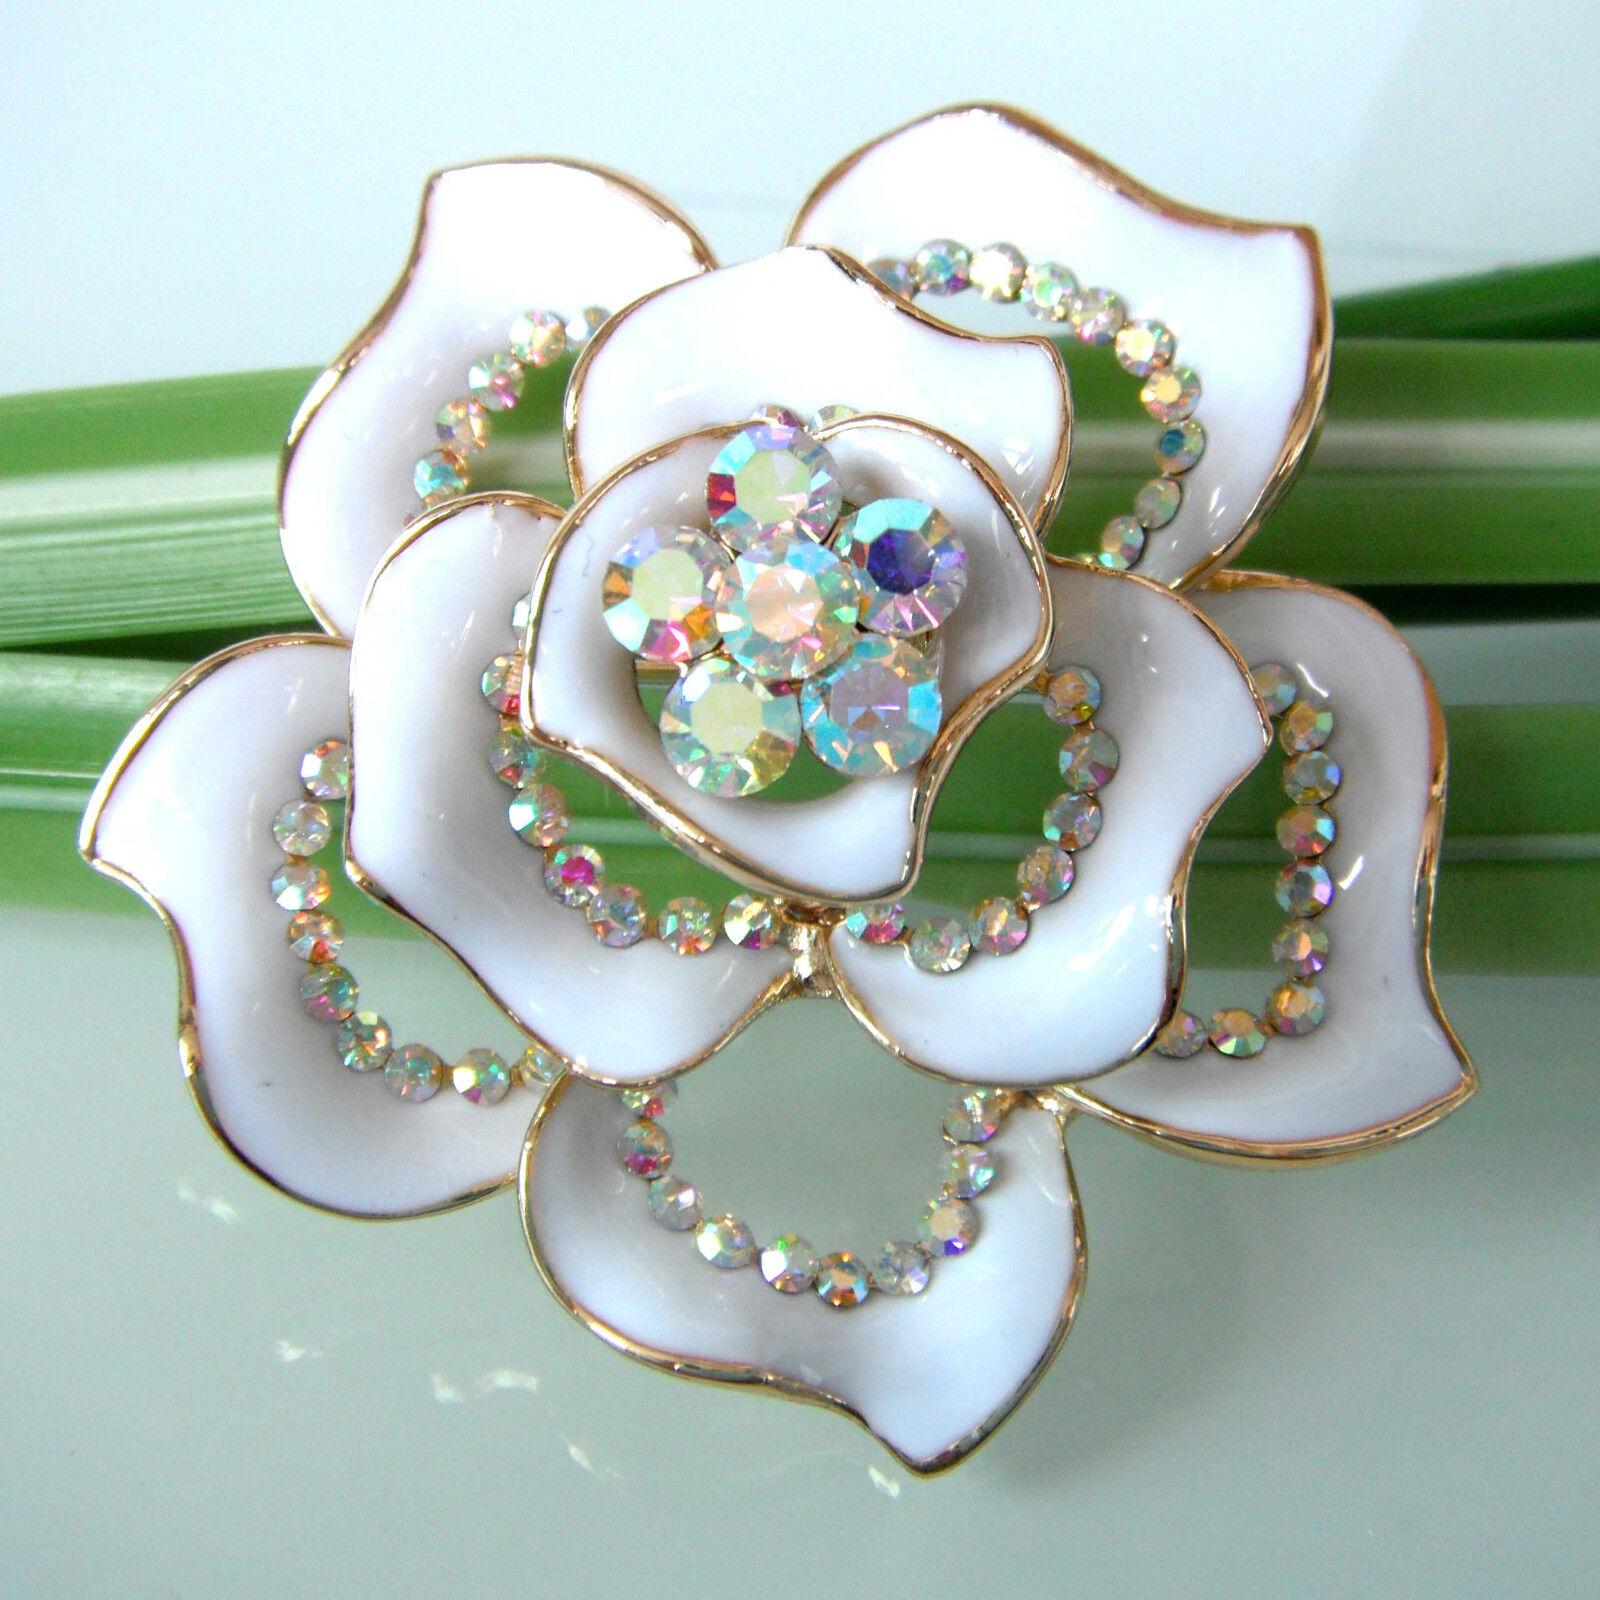 Navachi White Enamel 18k Gp Crystal Flower Brooch Pin Bh7790 Ebay